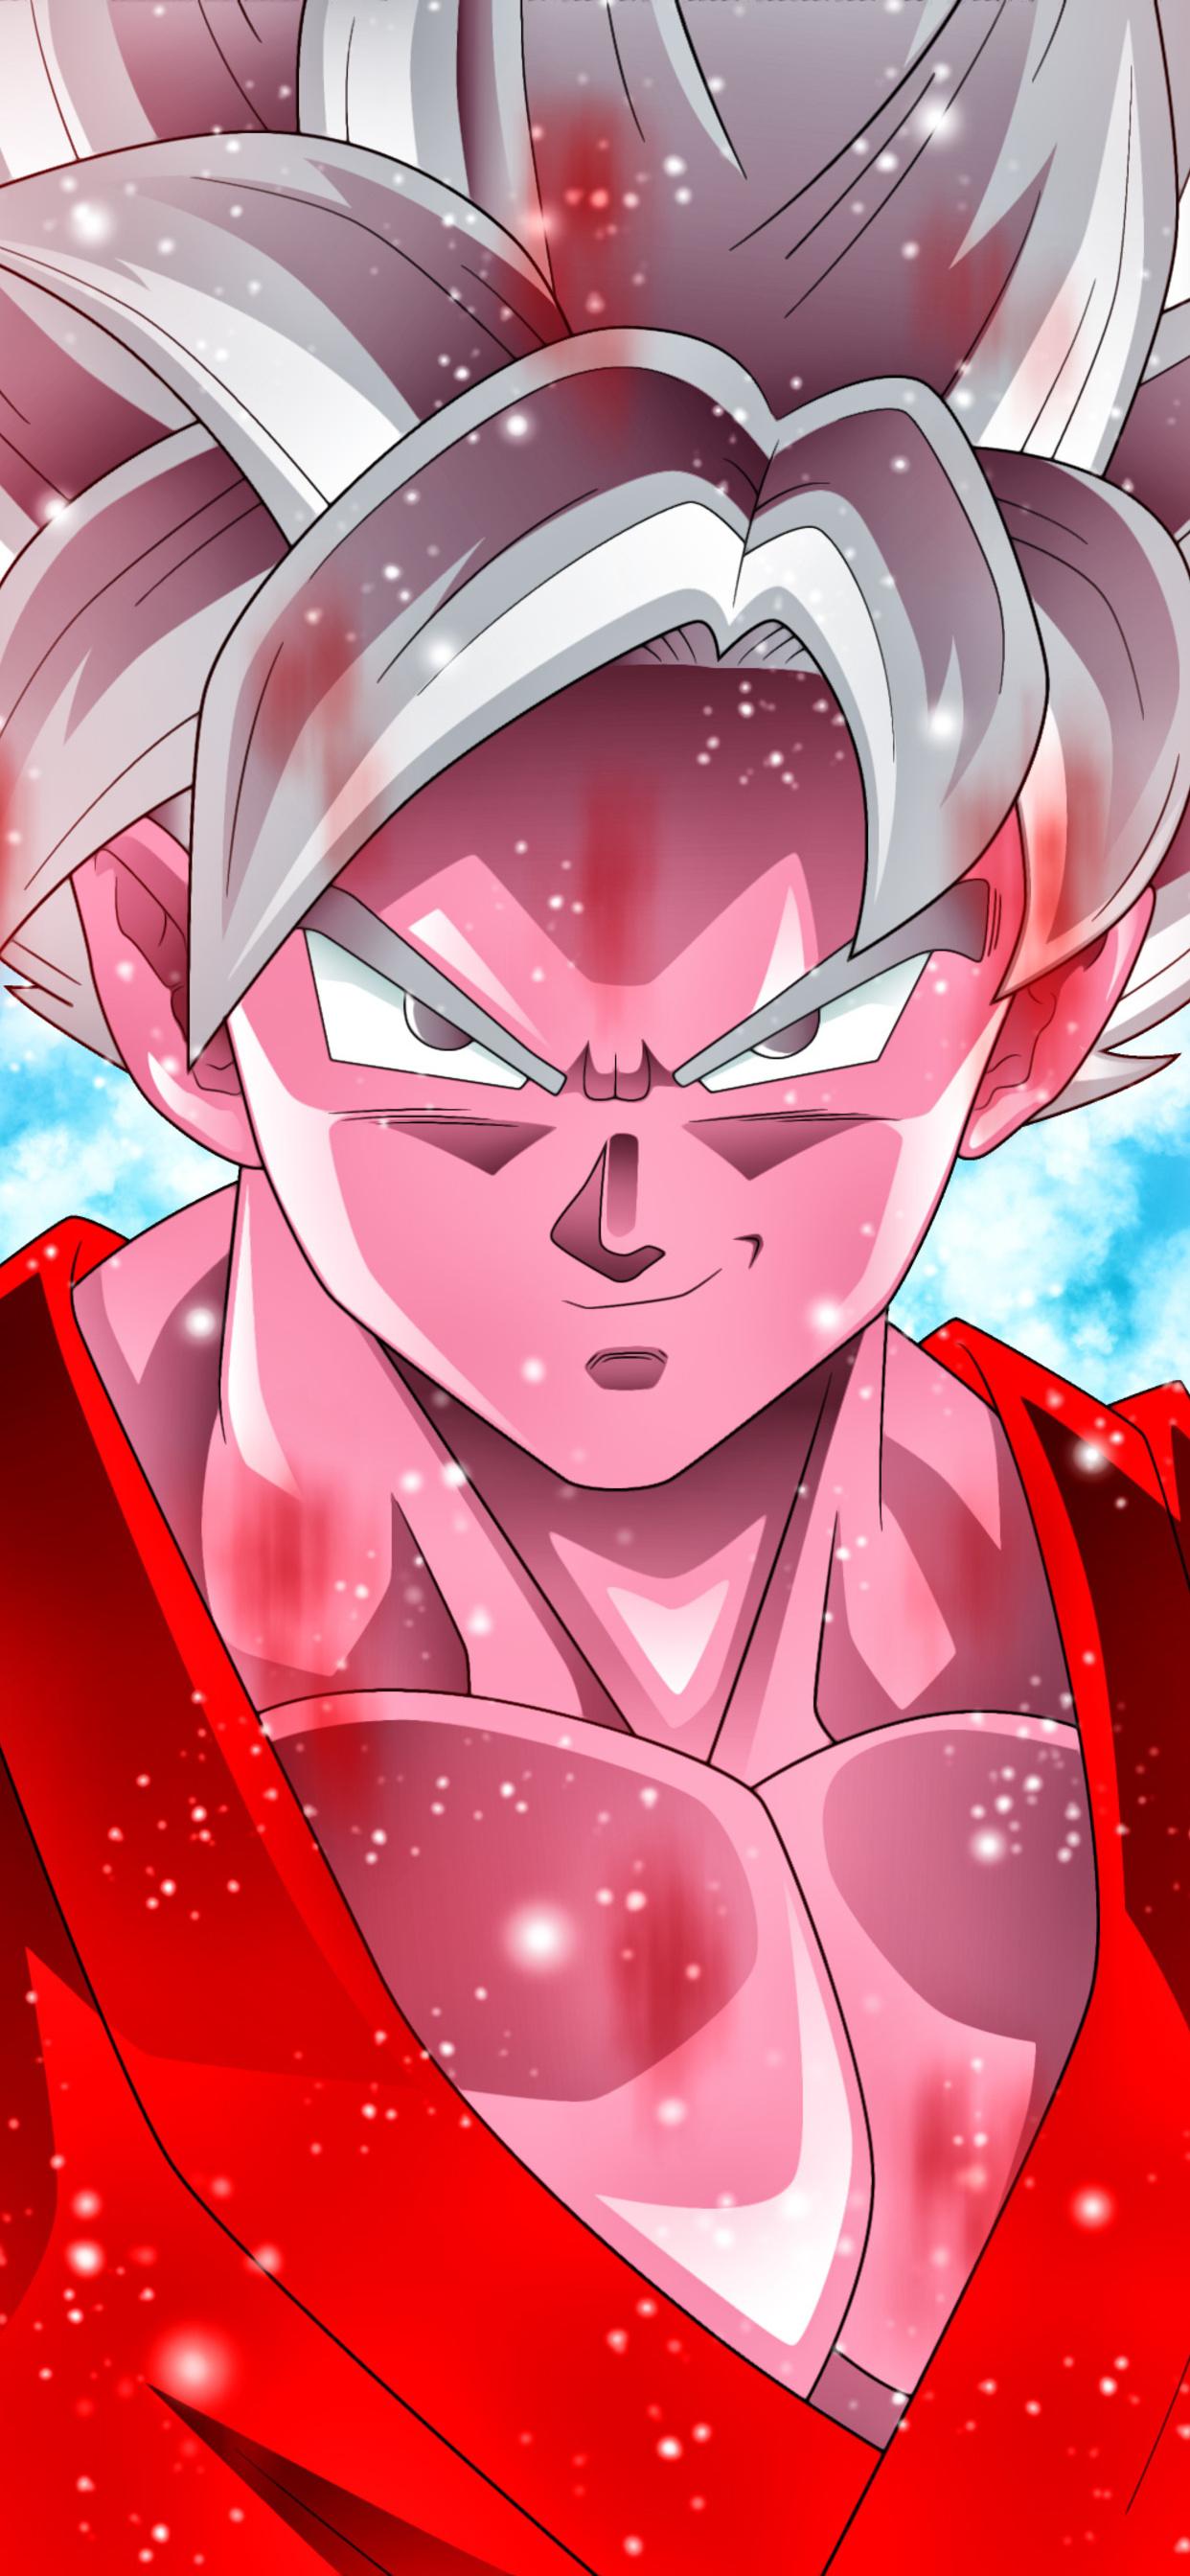 1242x2688 4k Dragon Ball Super Goku Iphone Xs Max Hd 4k Wallpapers